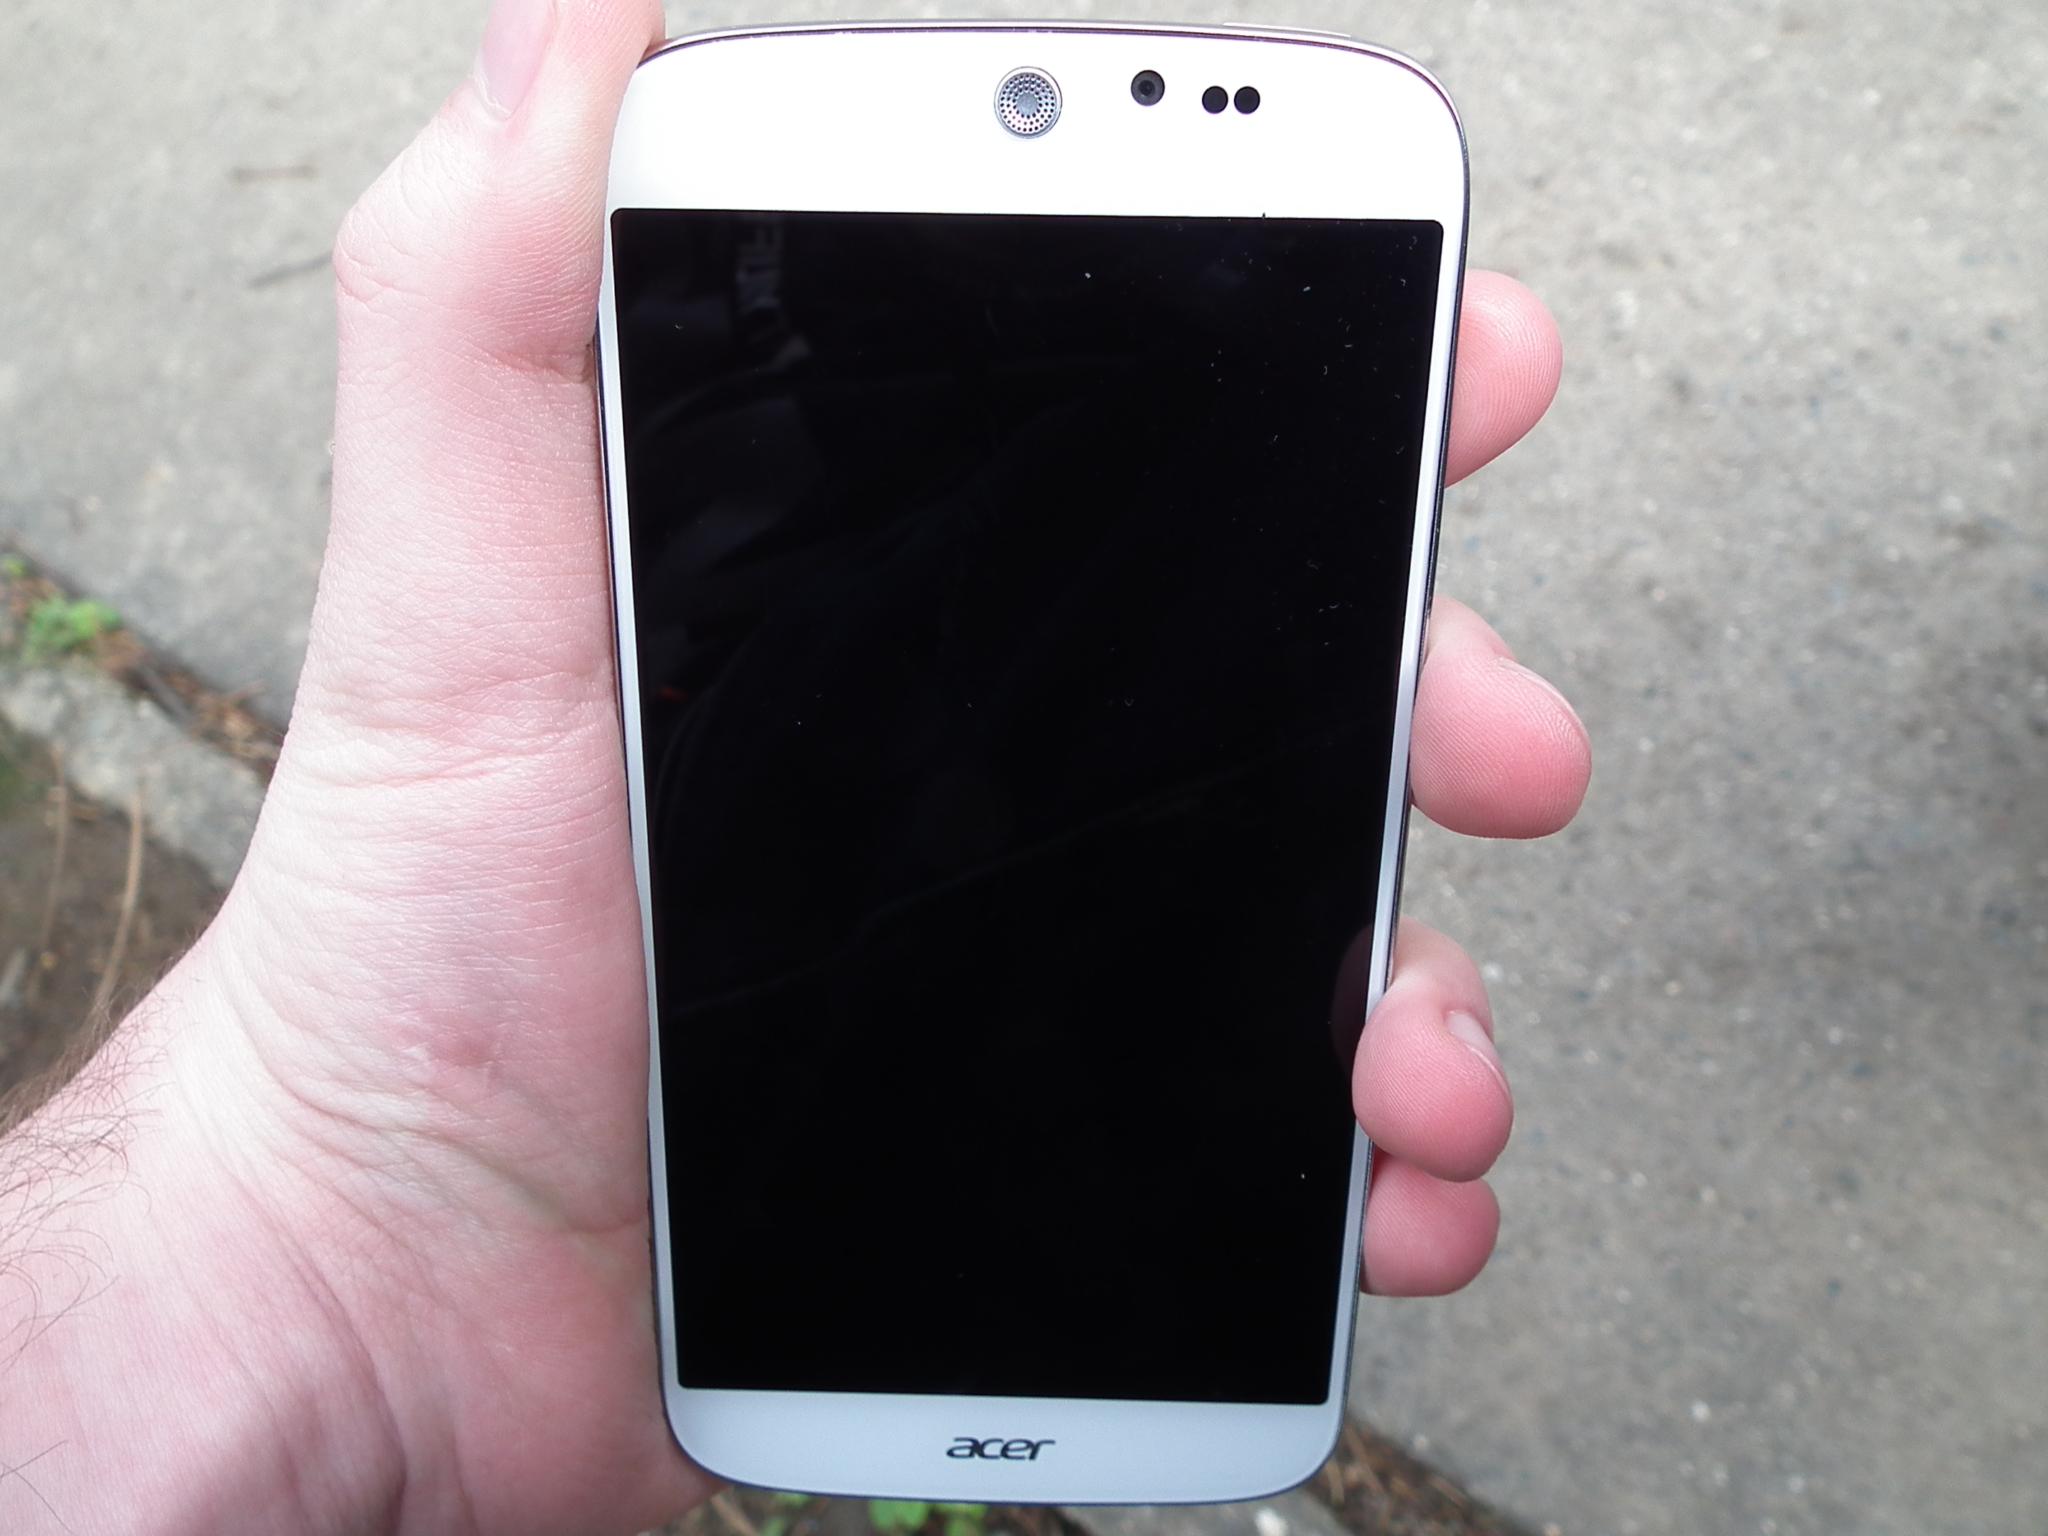 Acer Liquid Jade Vrvorajc Lowend Tenk A Lehk Jako Prko S55 Dual Sim Rozhodl Jsem Se Otestovat Jeden Model Kter Vzbouzel U Uivatel Men Pozdvien Je Jm Pat Do Kategorie Ni Stedn Tdy